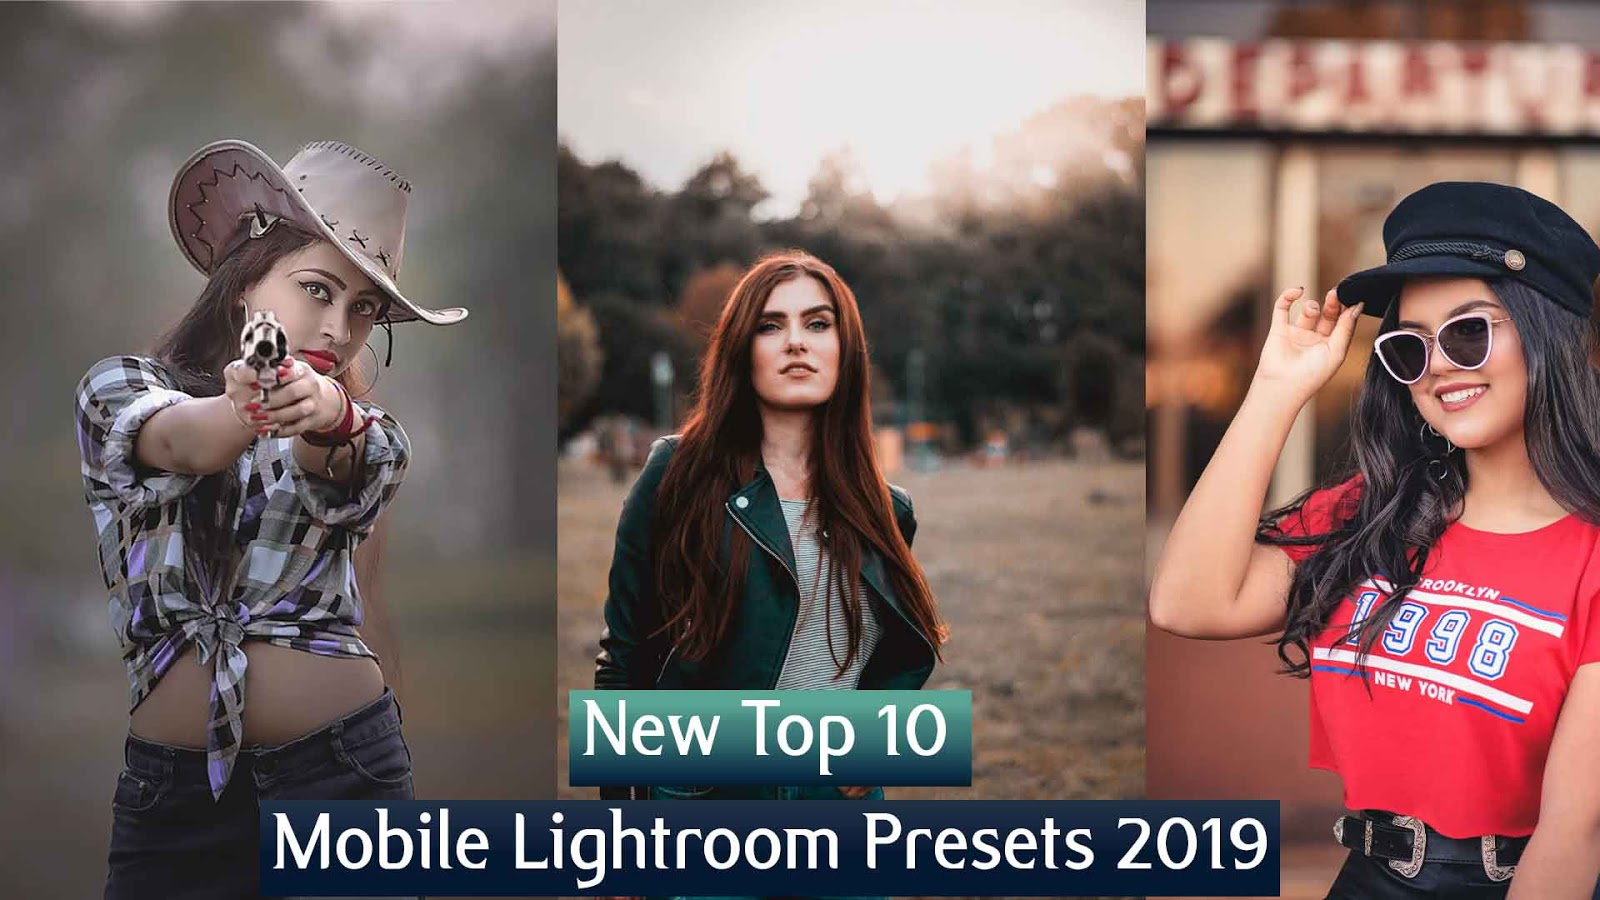 New Top 10 Mobile Lightroom Presets 2019 Free Download